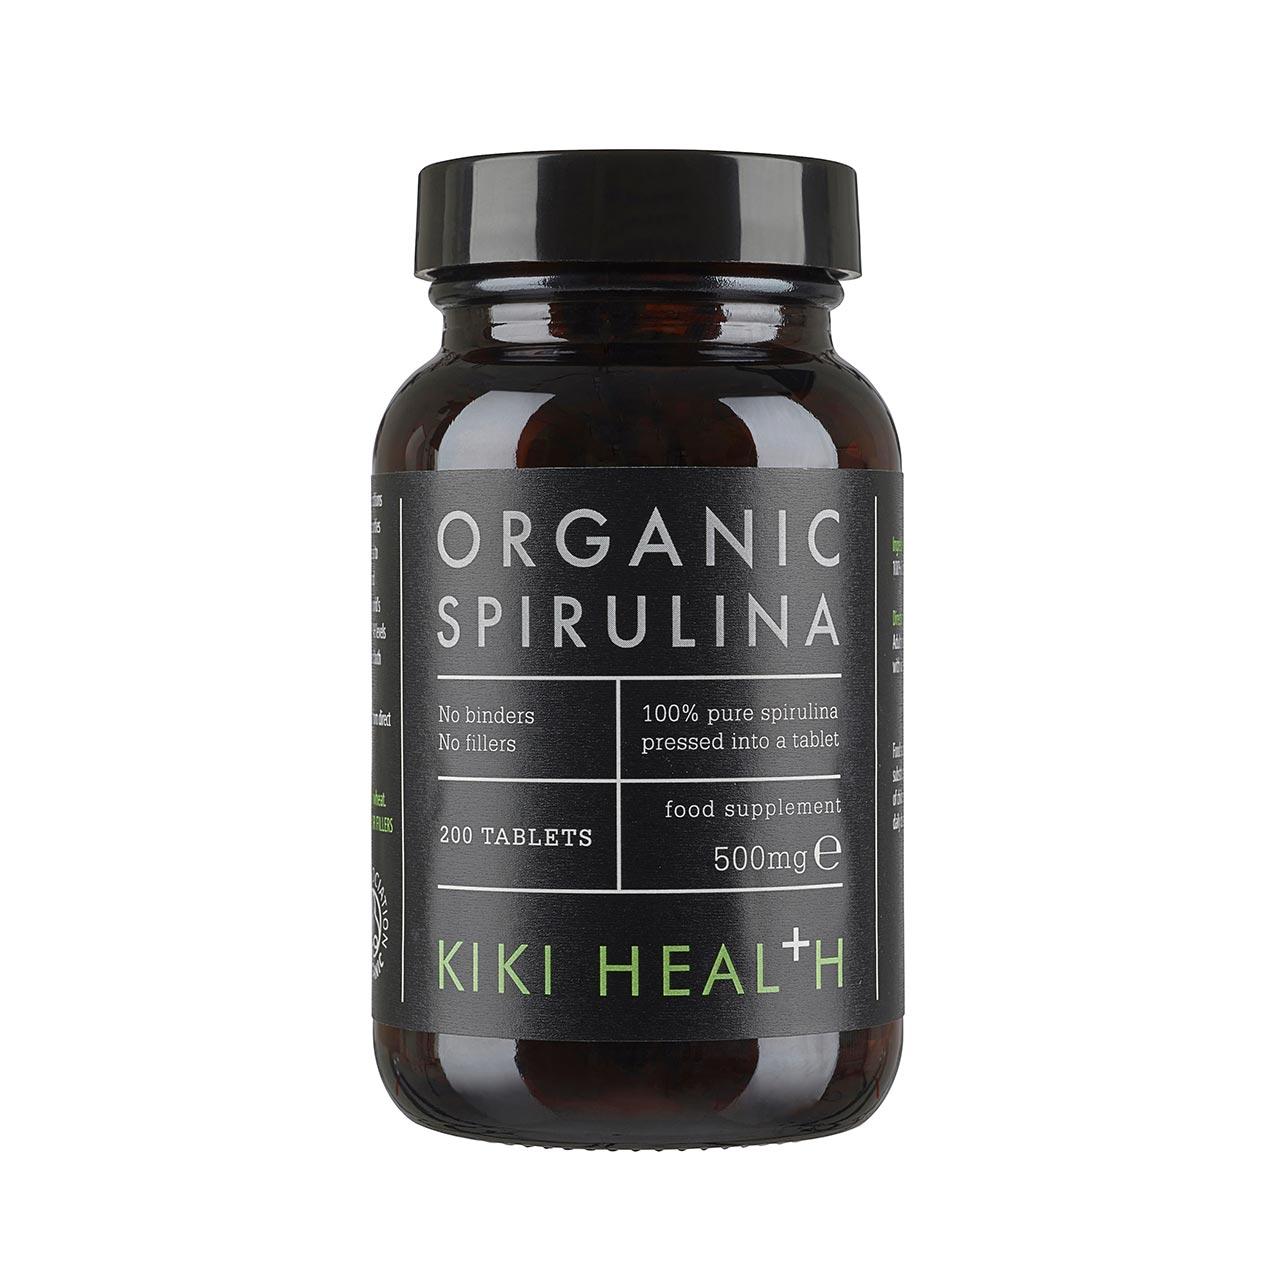 Organic Spirulina 500mg 200's